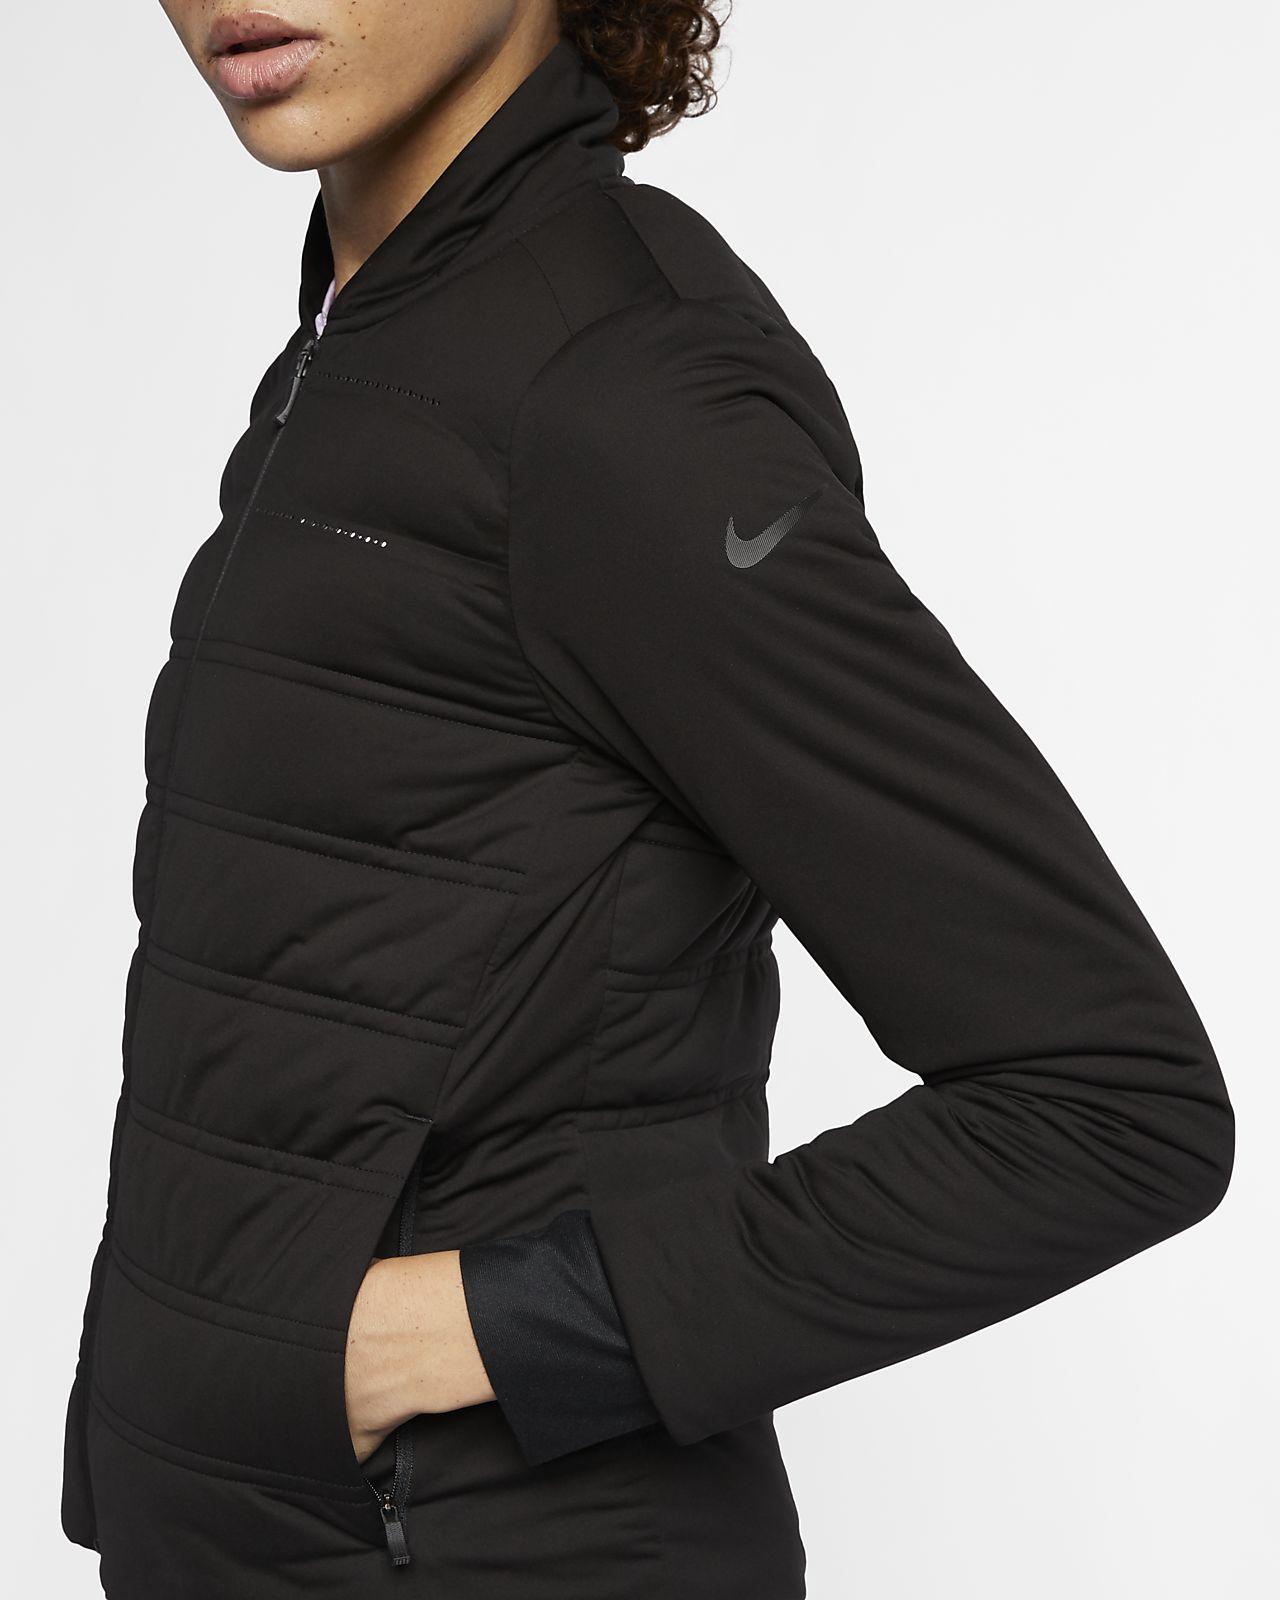 7c21d103889a Low Resolution Nike AeroLoft Women s Golf Jacket Nike AeroLoft Women s Golf  Jacket